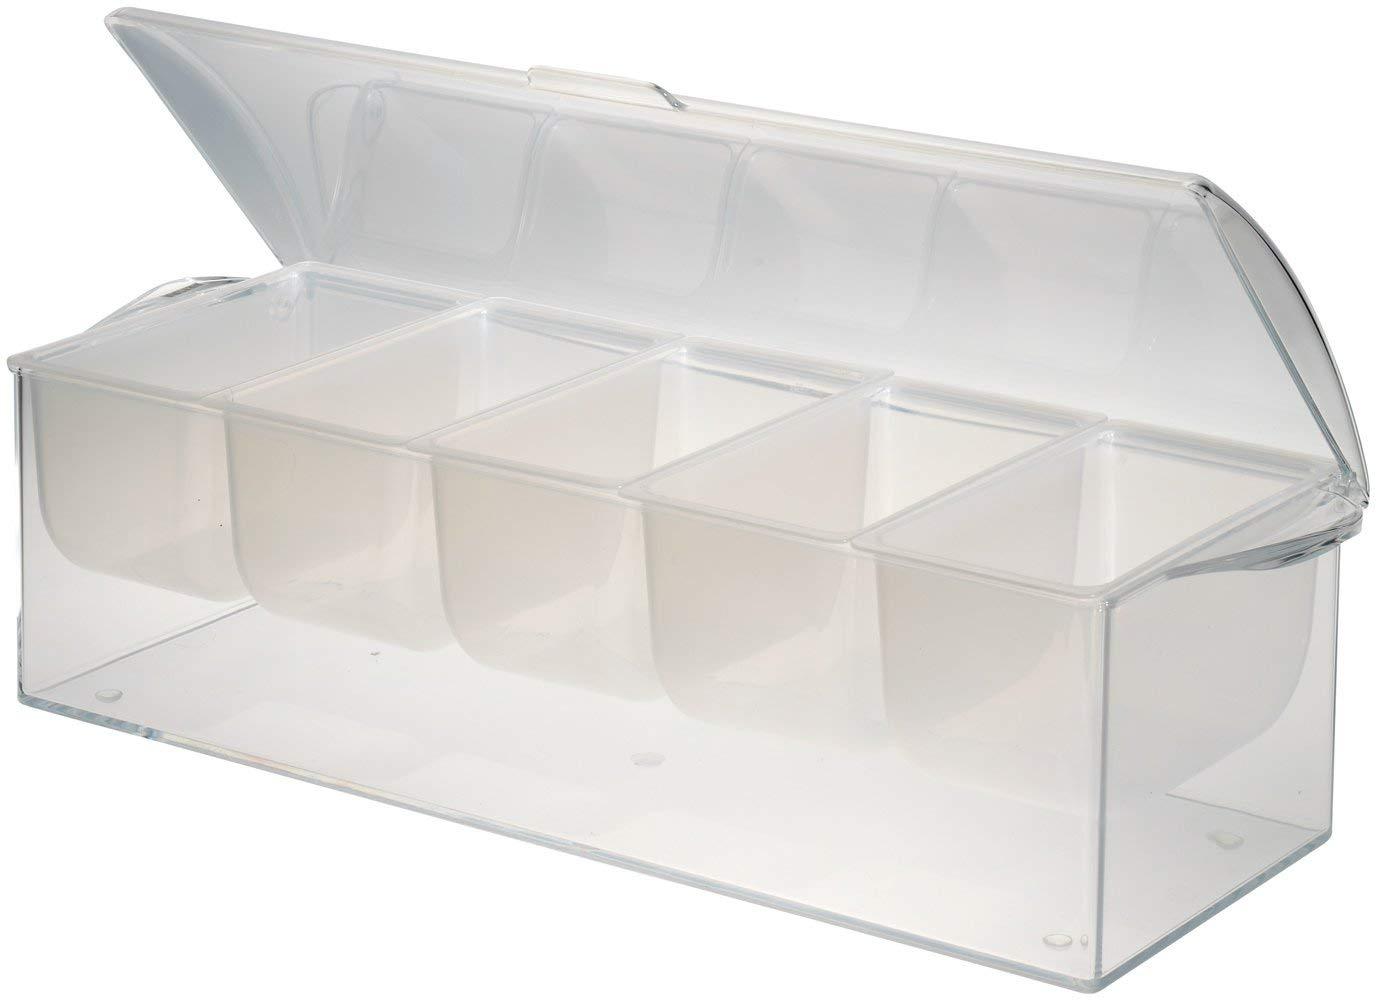 Icy Condiment Server by Icy Condiment Server